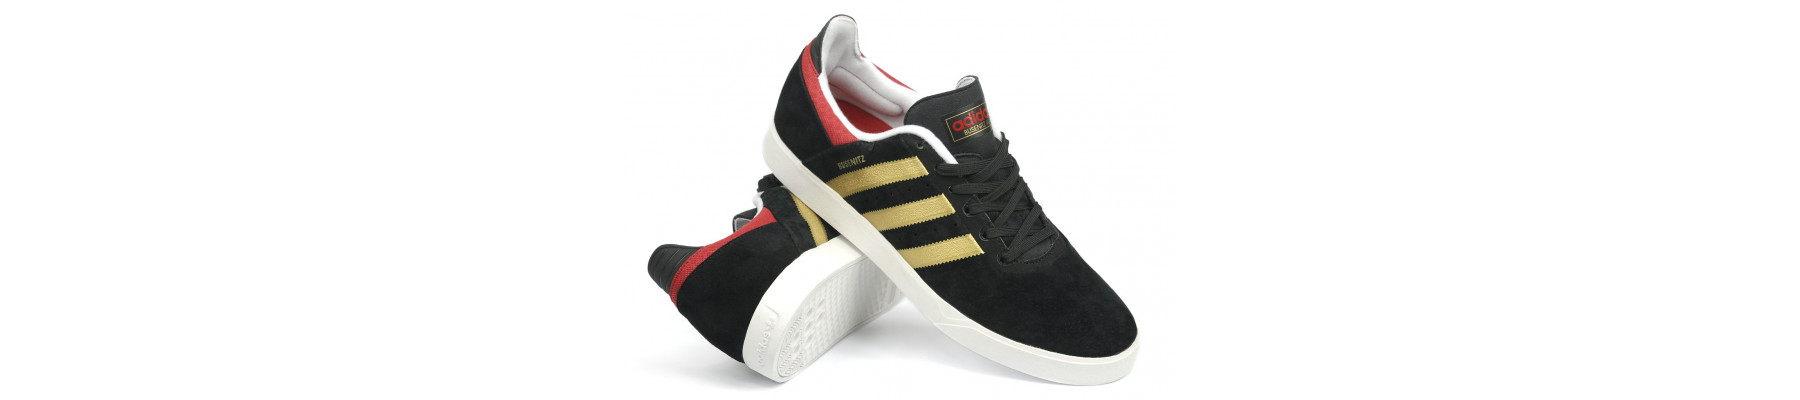 Adidas Skateboarding Busenitz ADV Black